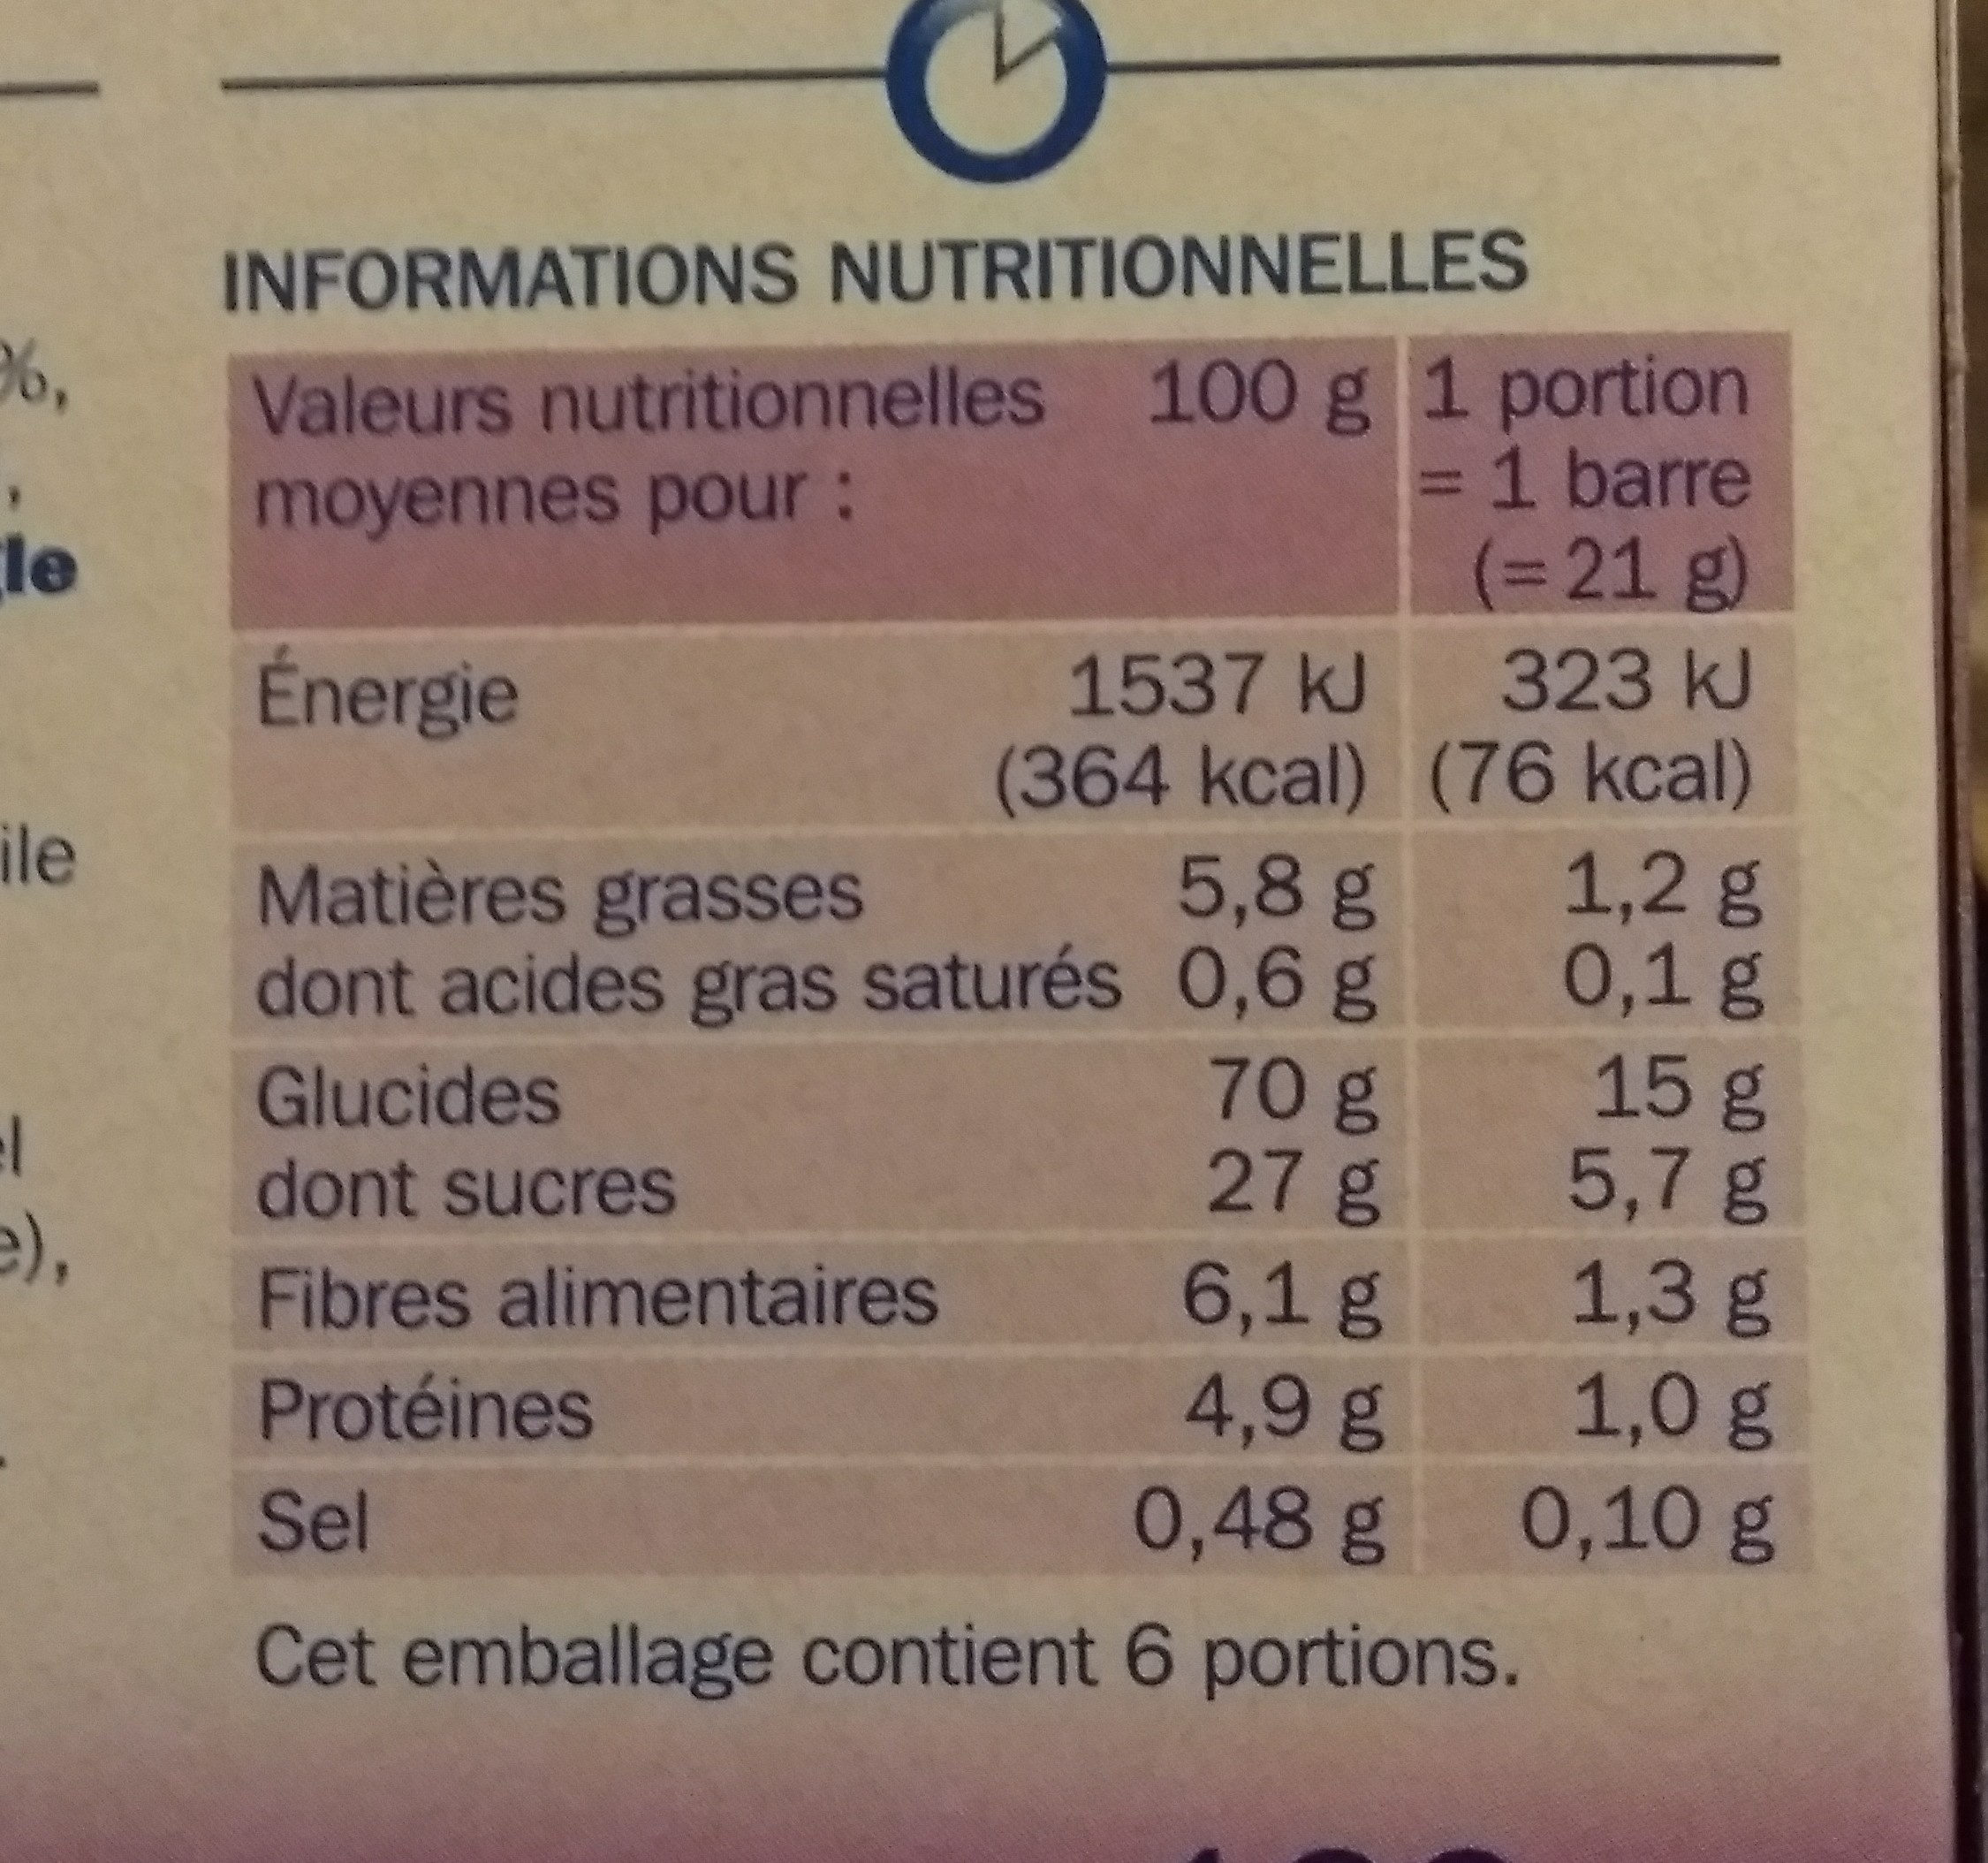 Barres céréales figue x 6 - Voedingswaarden - fr